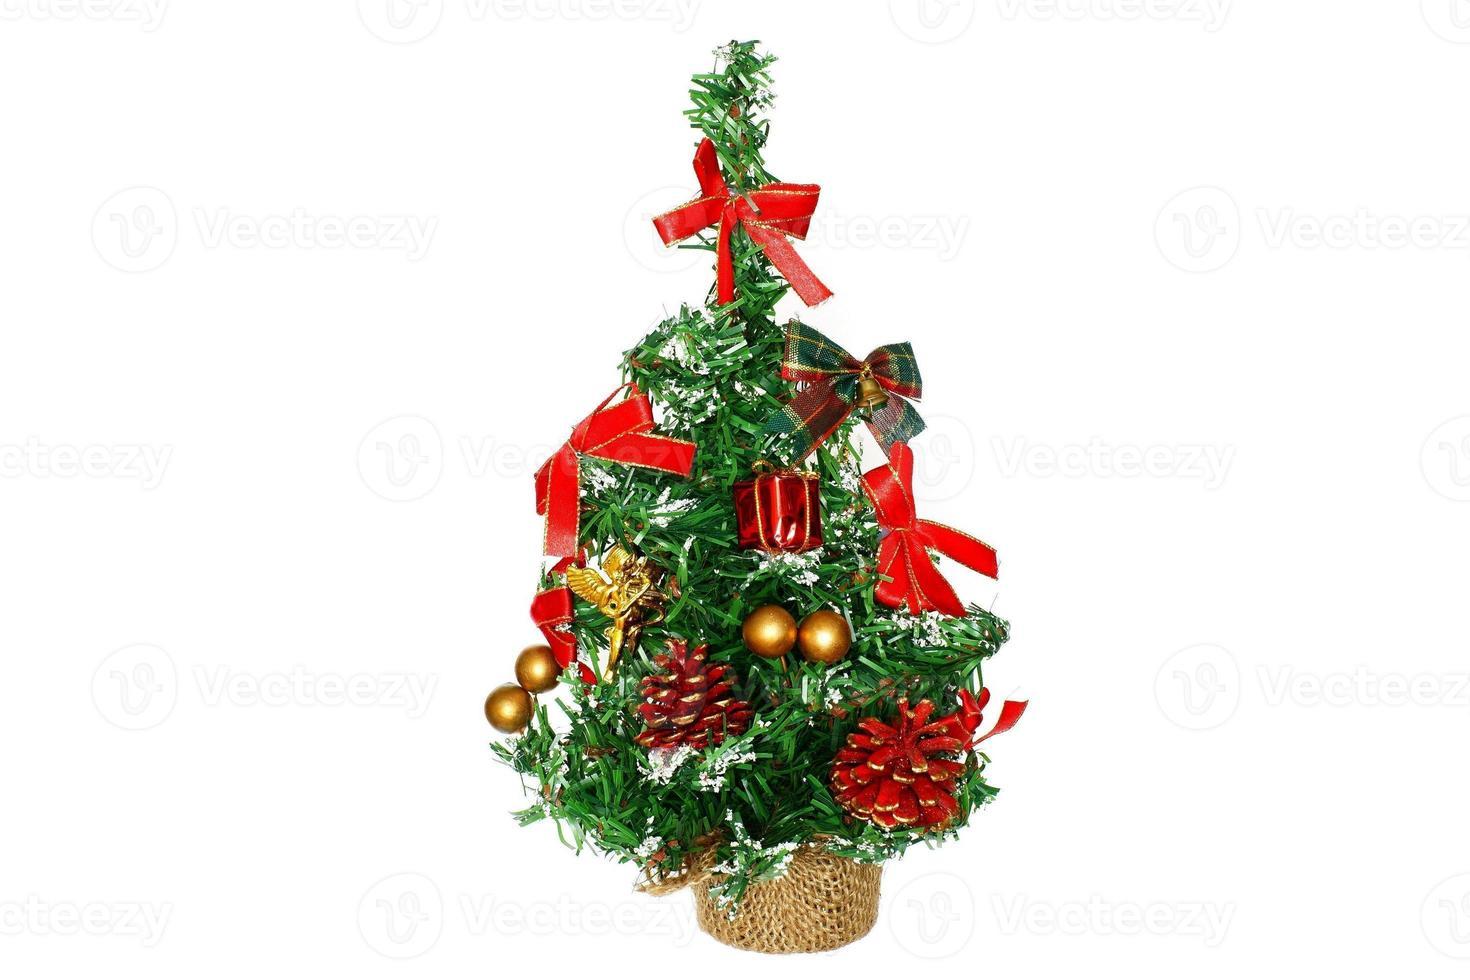 Fir-tree for Christmas holidays photo